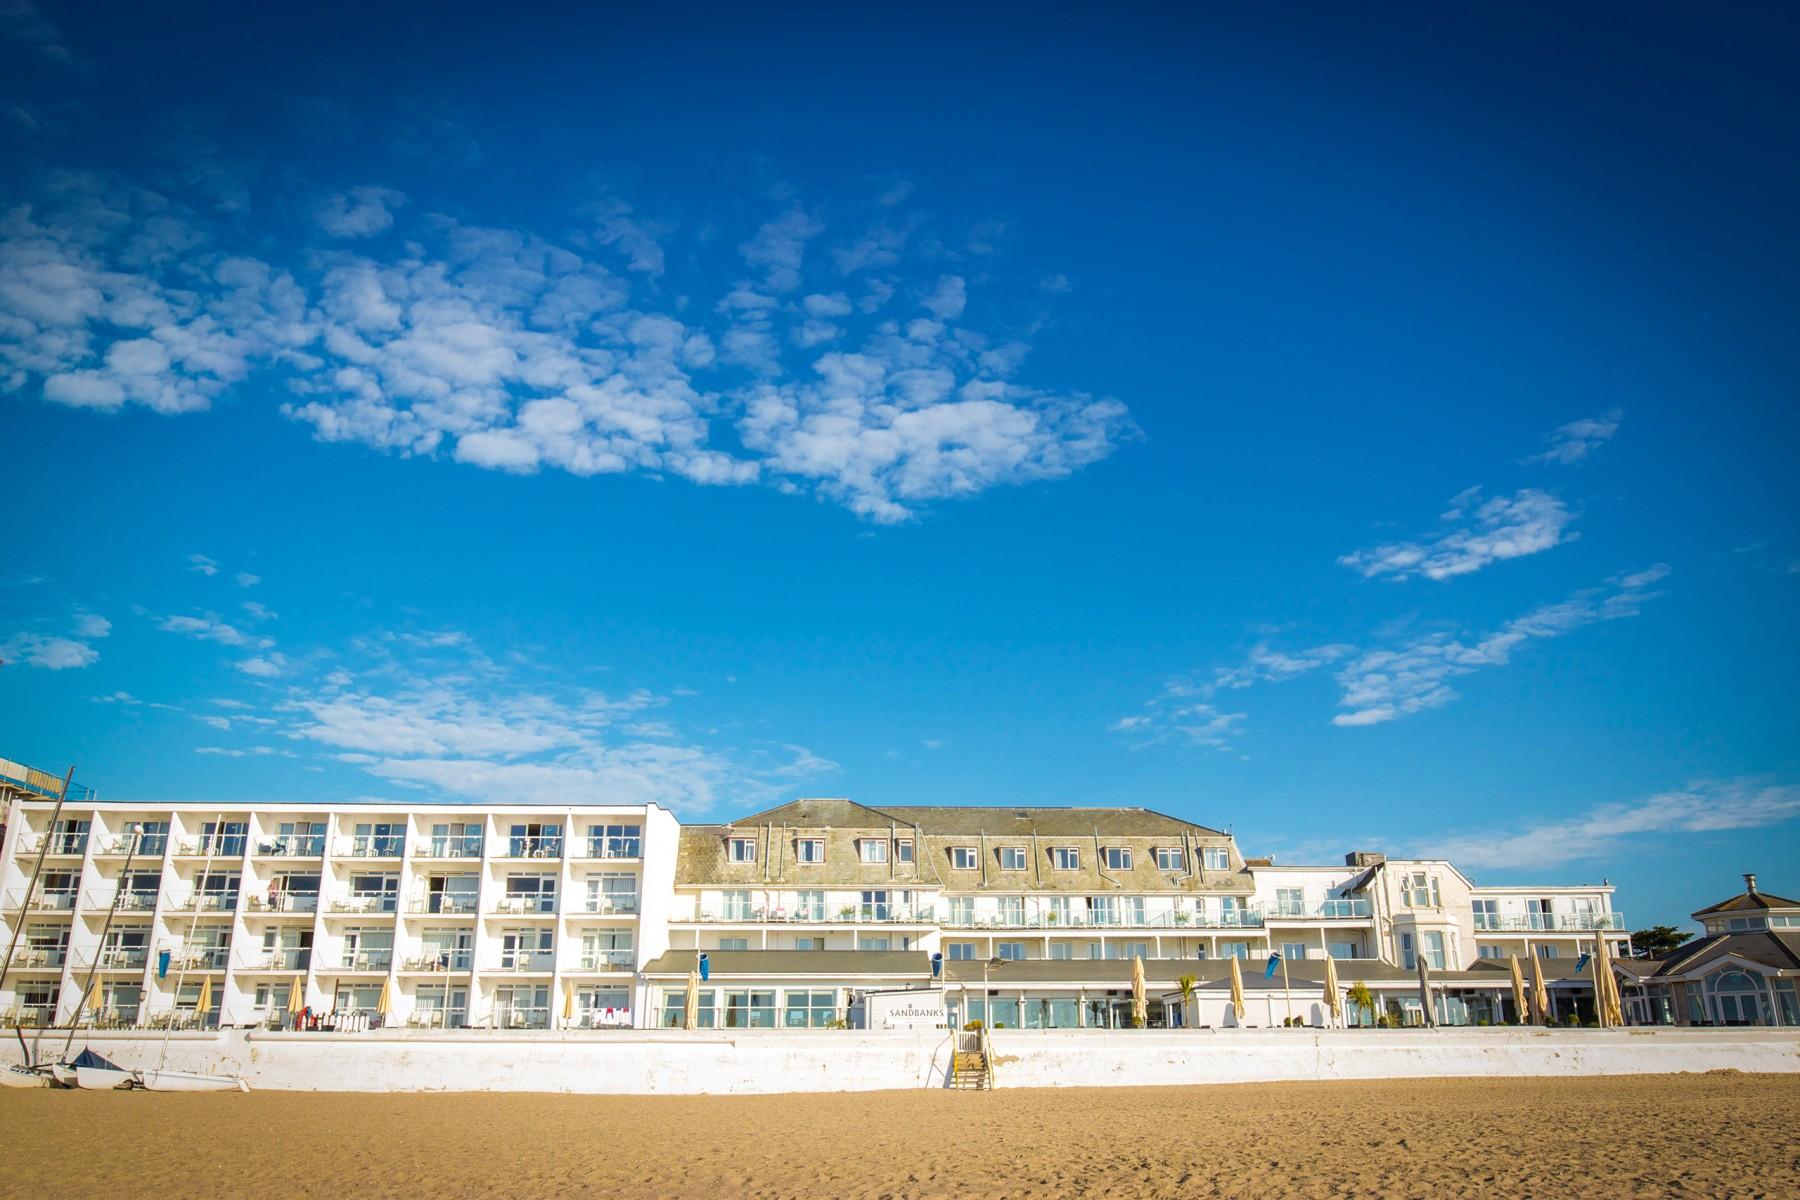 Sandbanks Hotel for hire